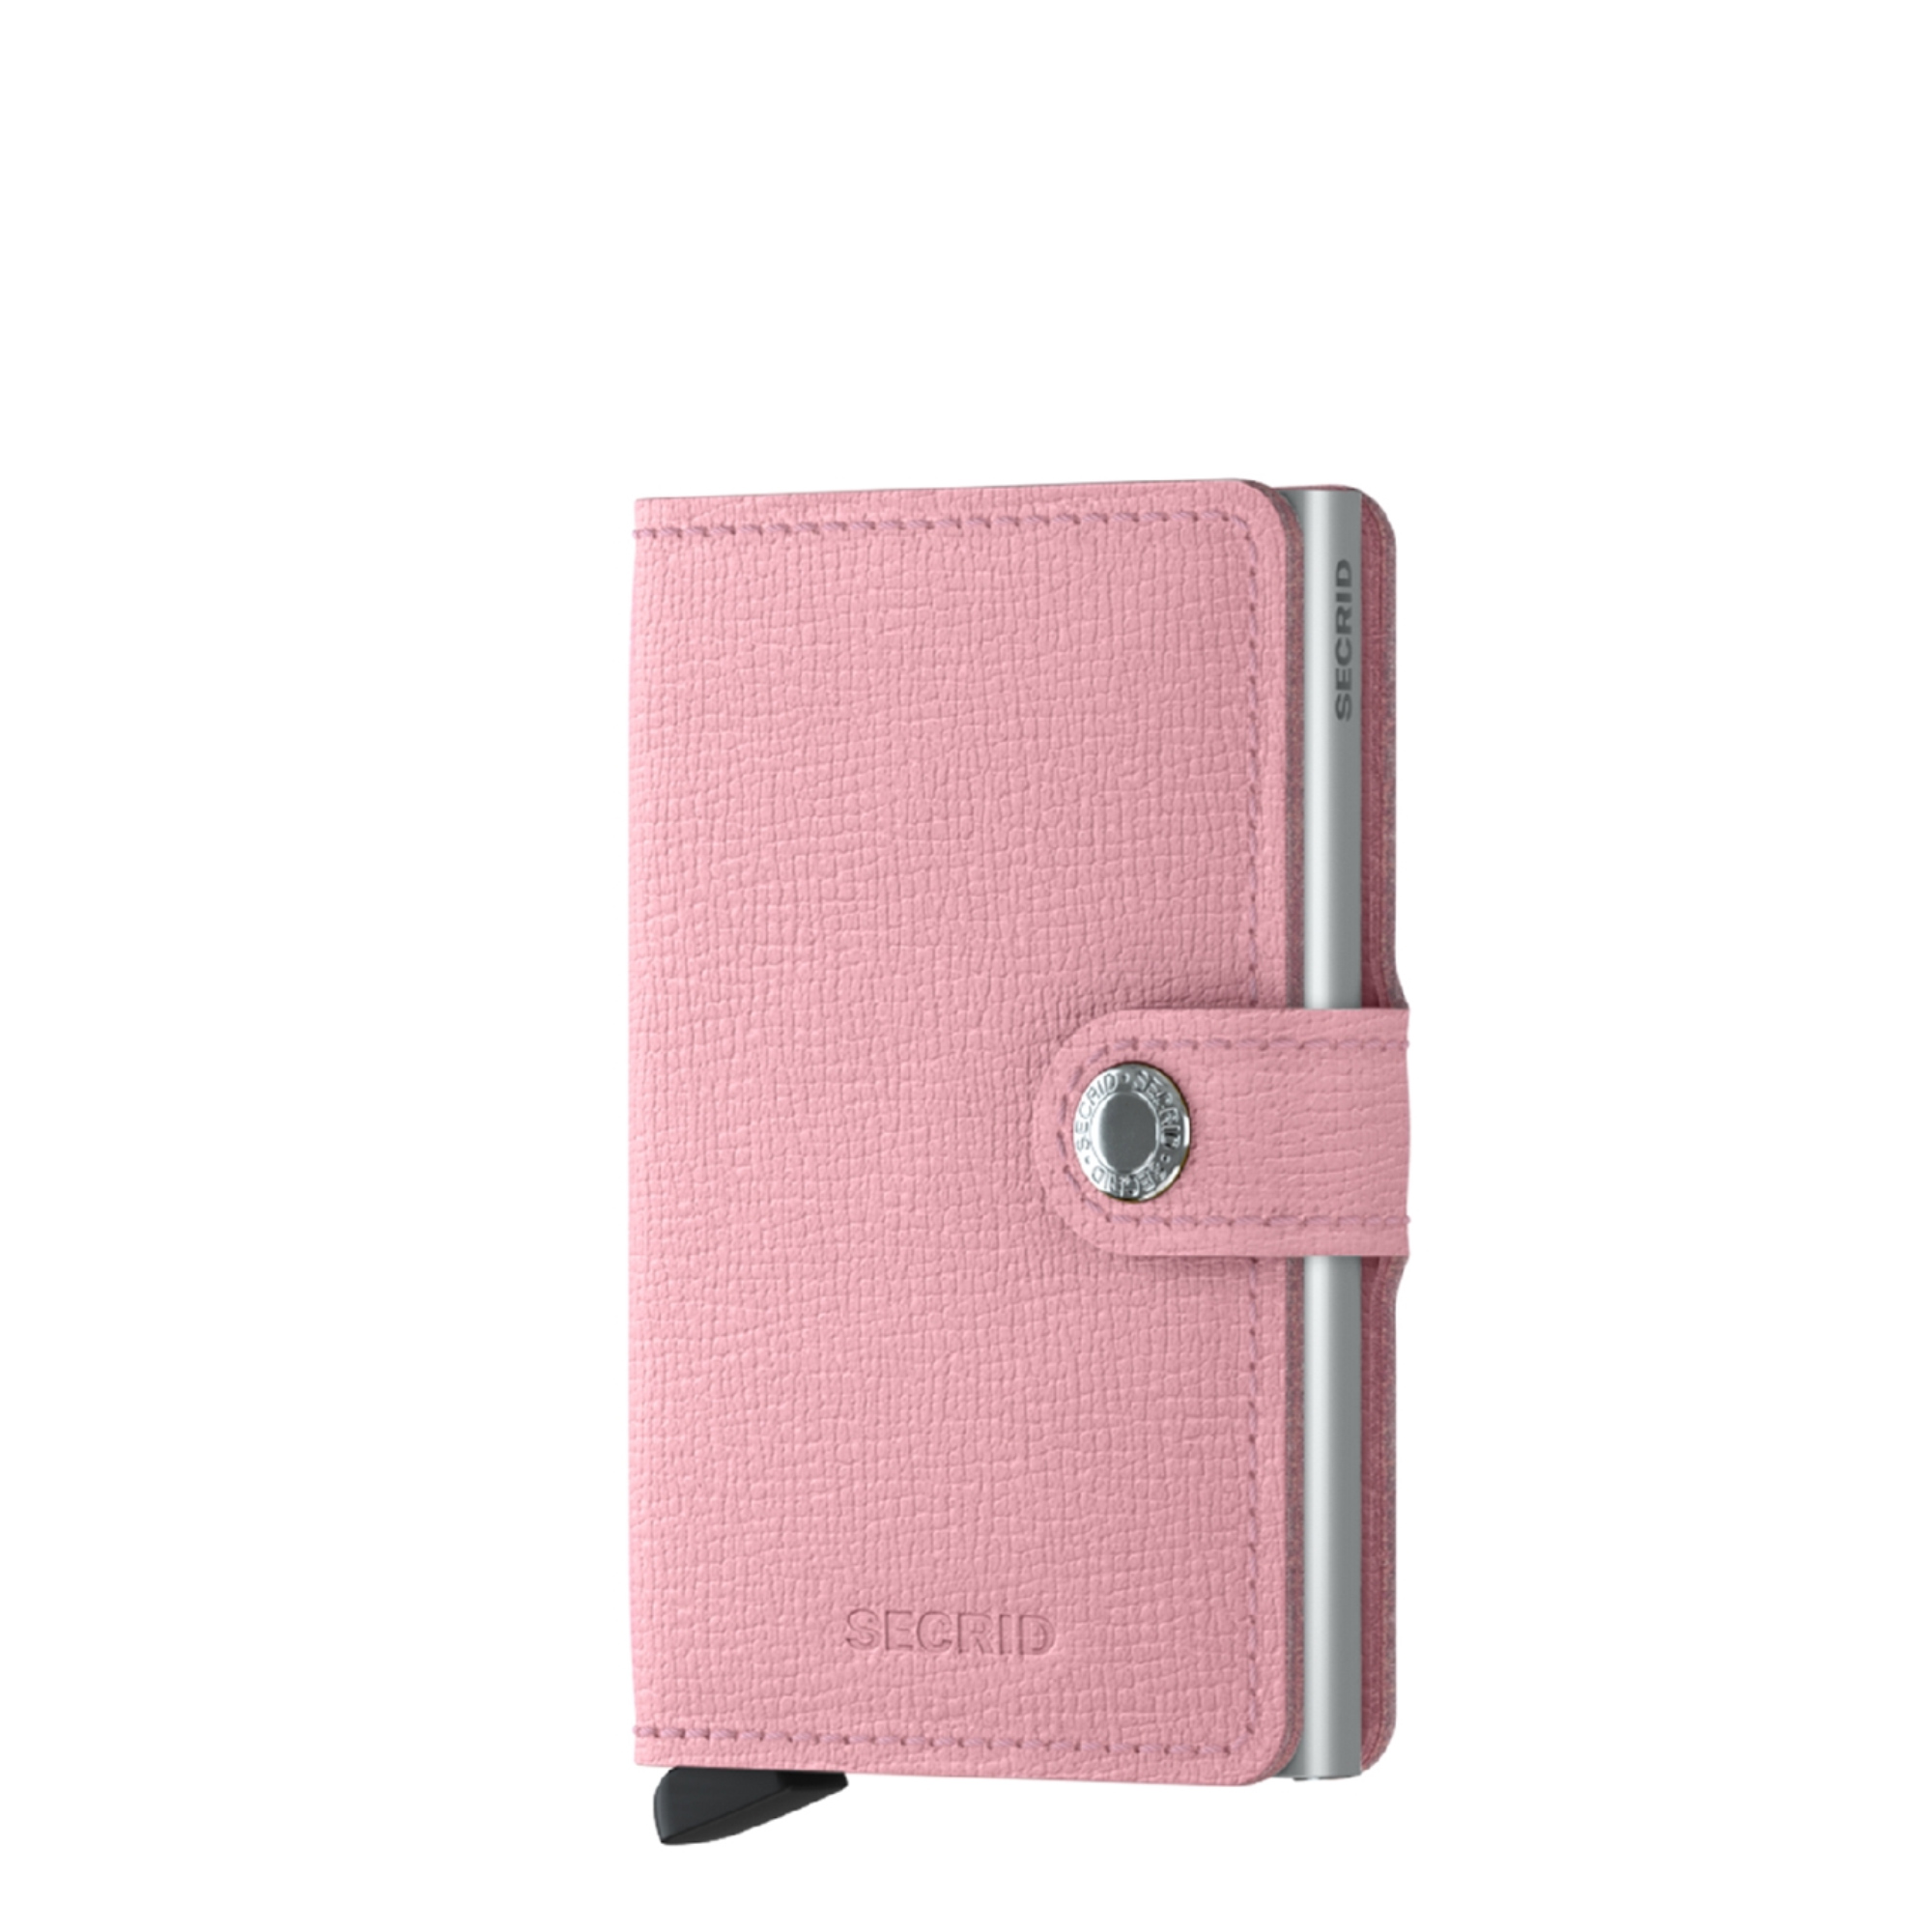 Secrid MC Miniwallet Crisple Pink